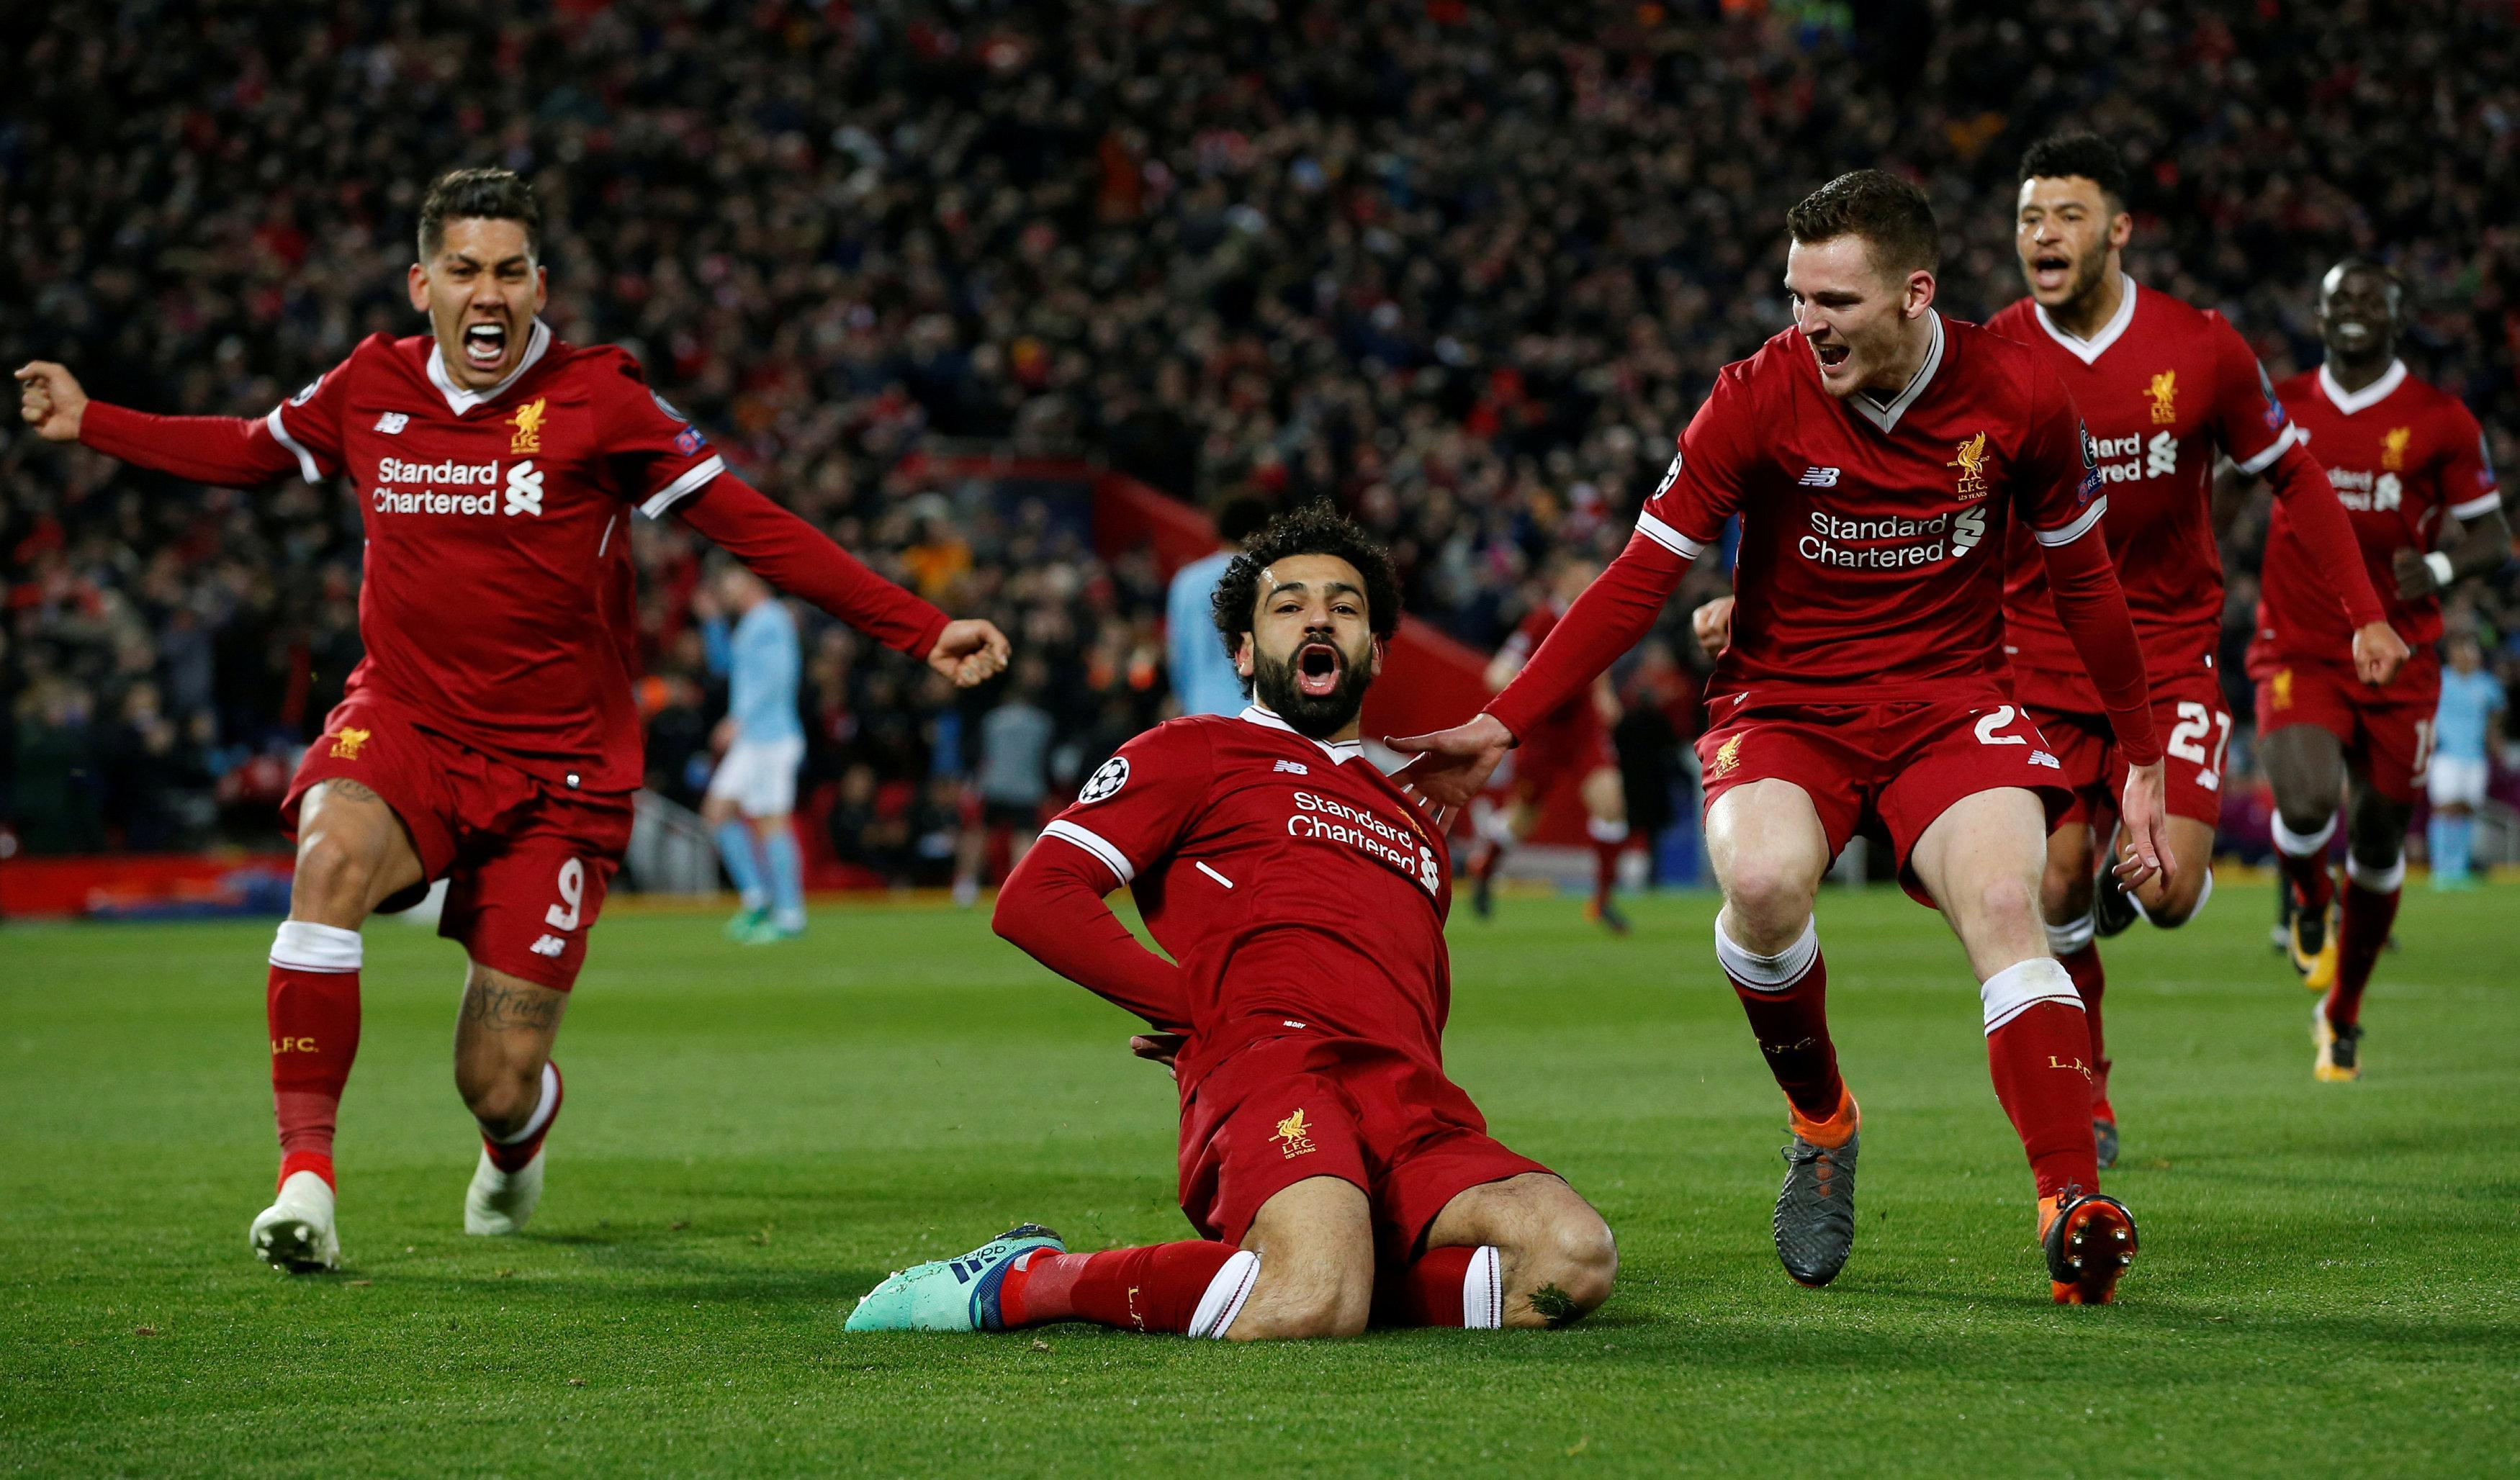 Mo Salah scored Liverpool's first goal from close range